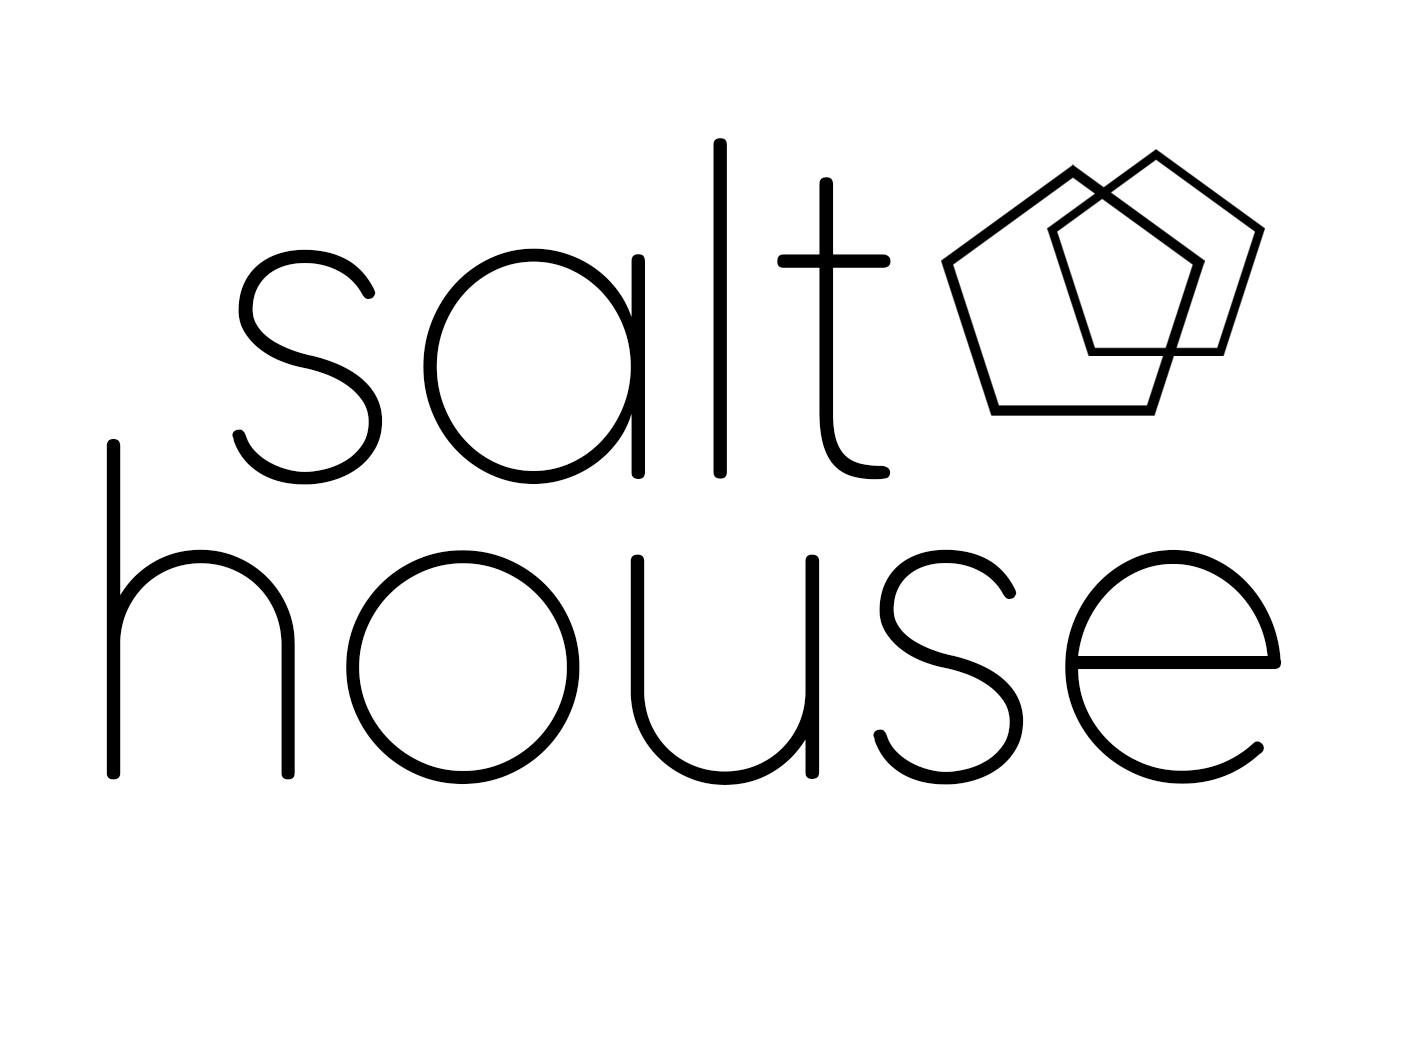 INTERIOR DECOR & STYLING BY SALT HOUSE INTERIORS